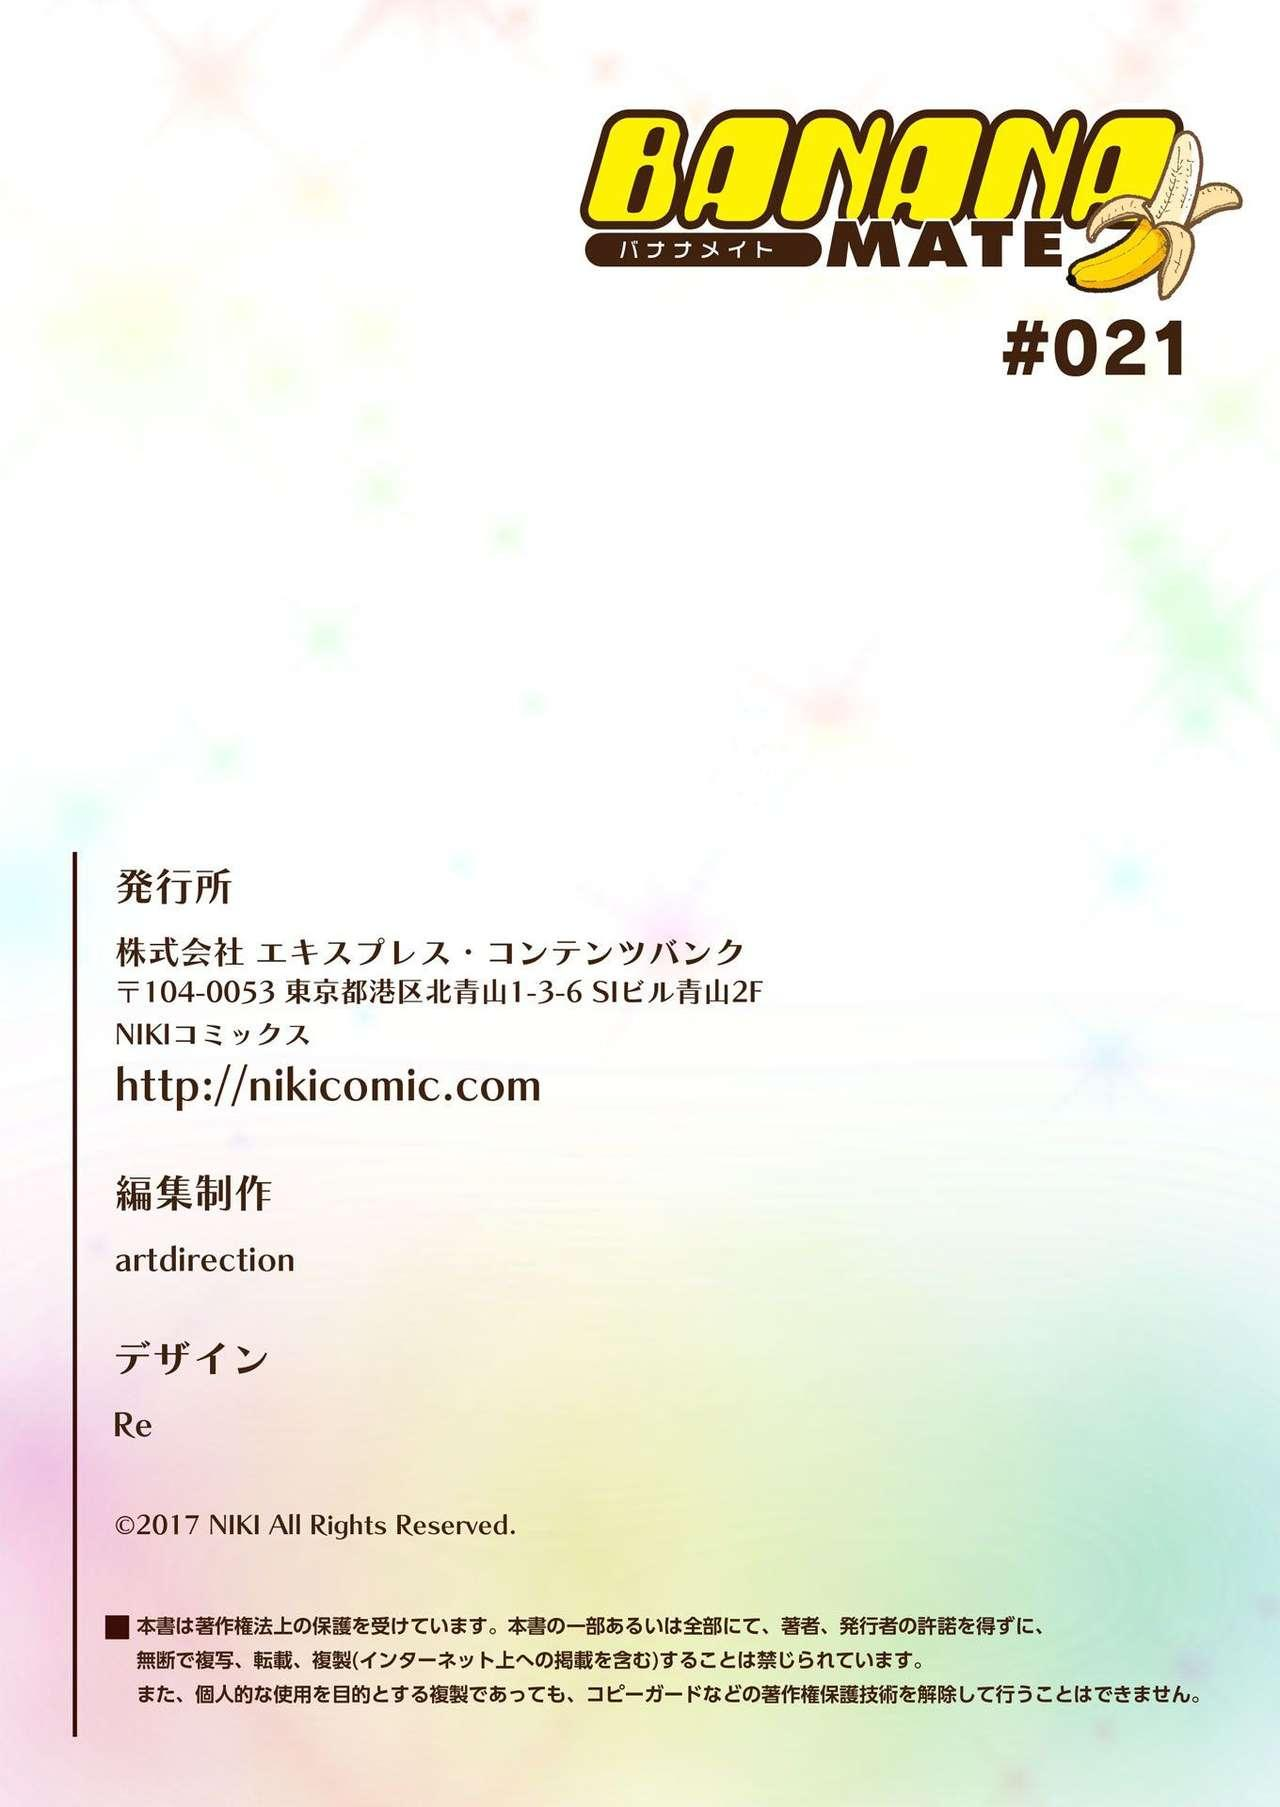 BANANAMATE Vol. 21 256